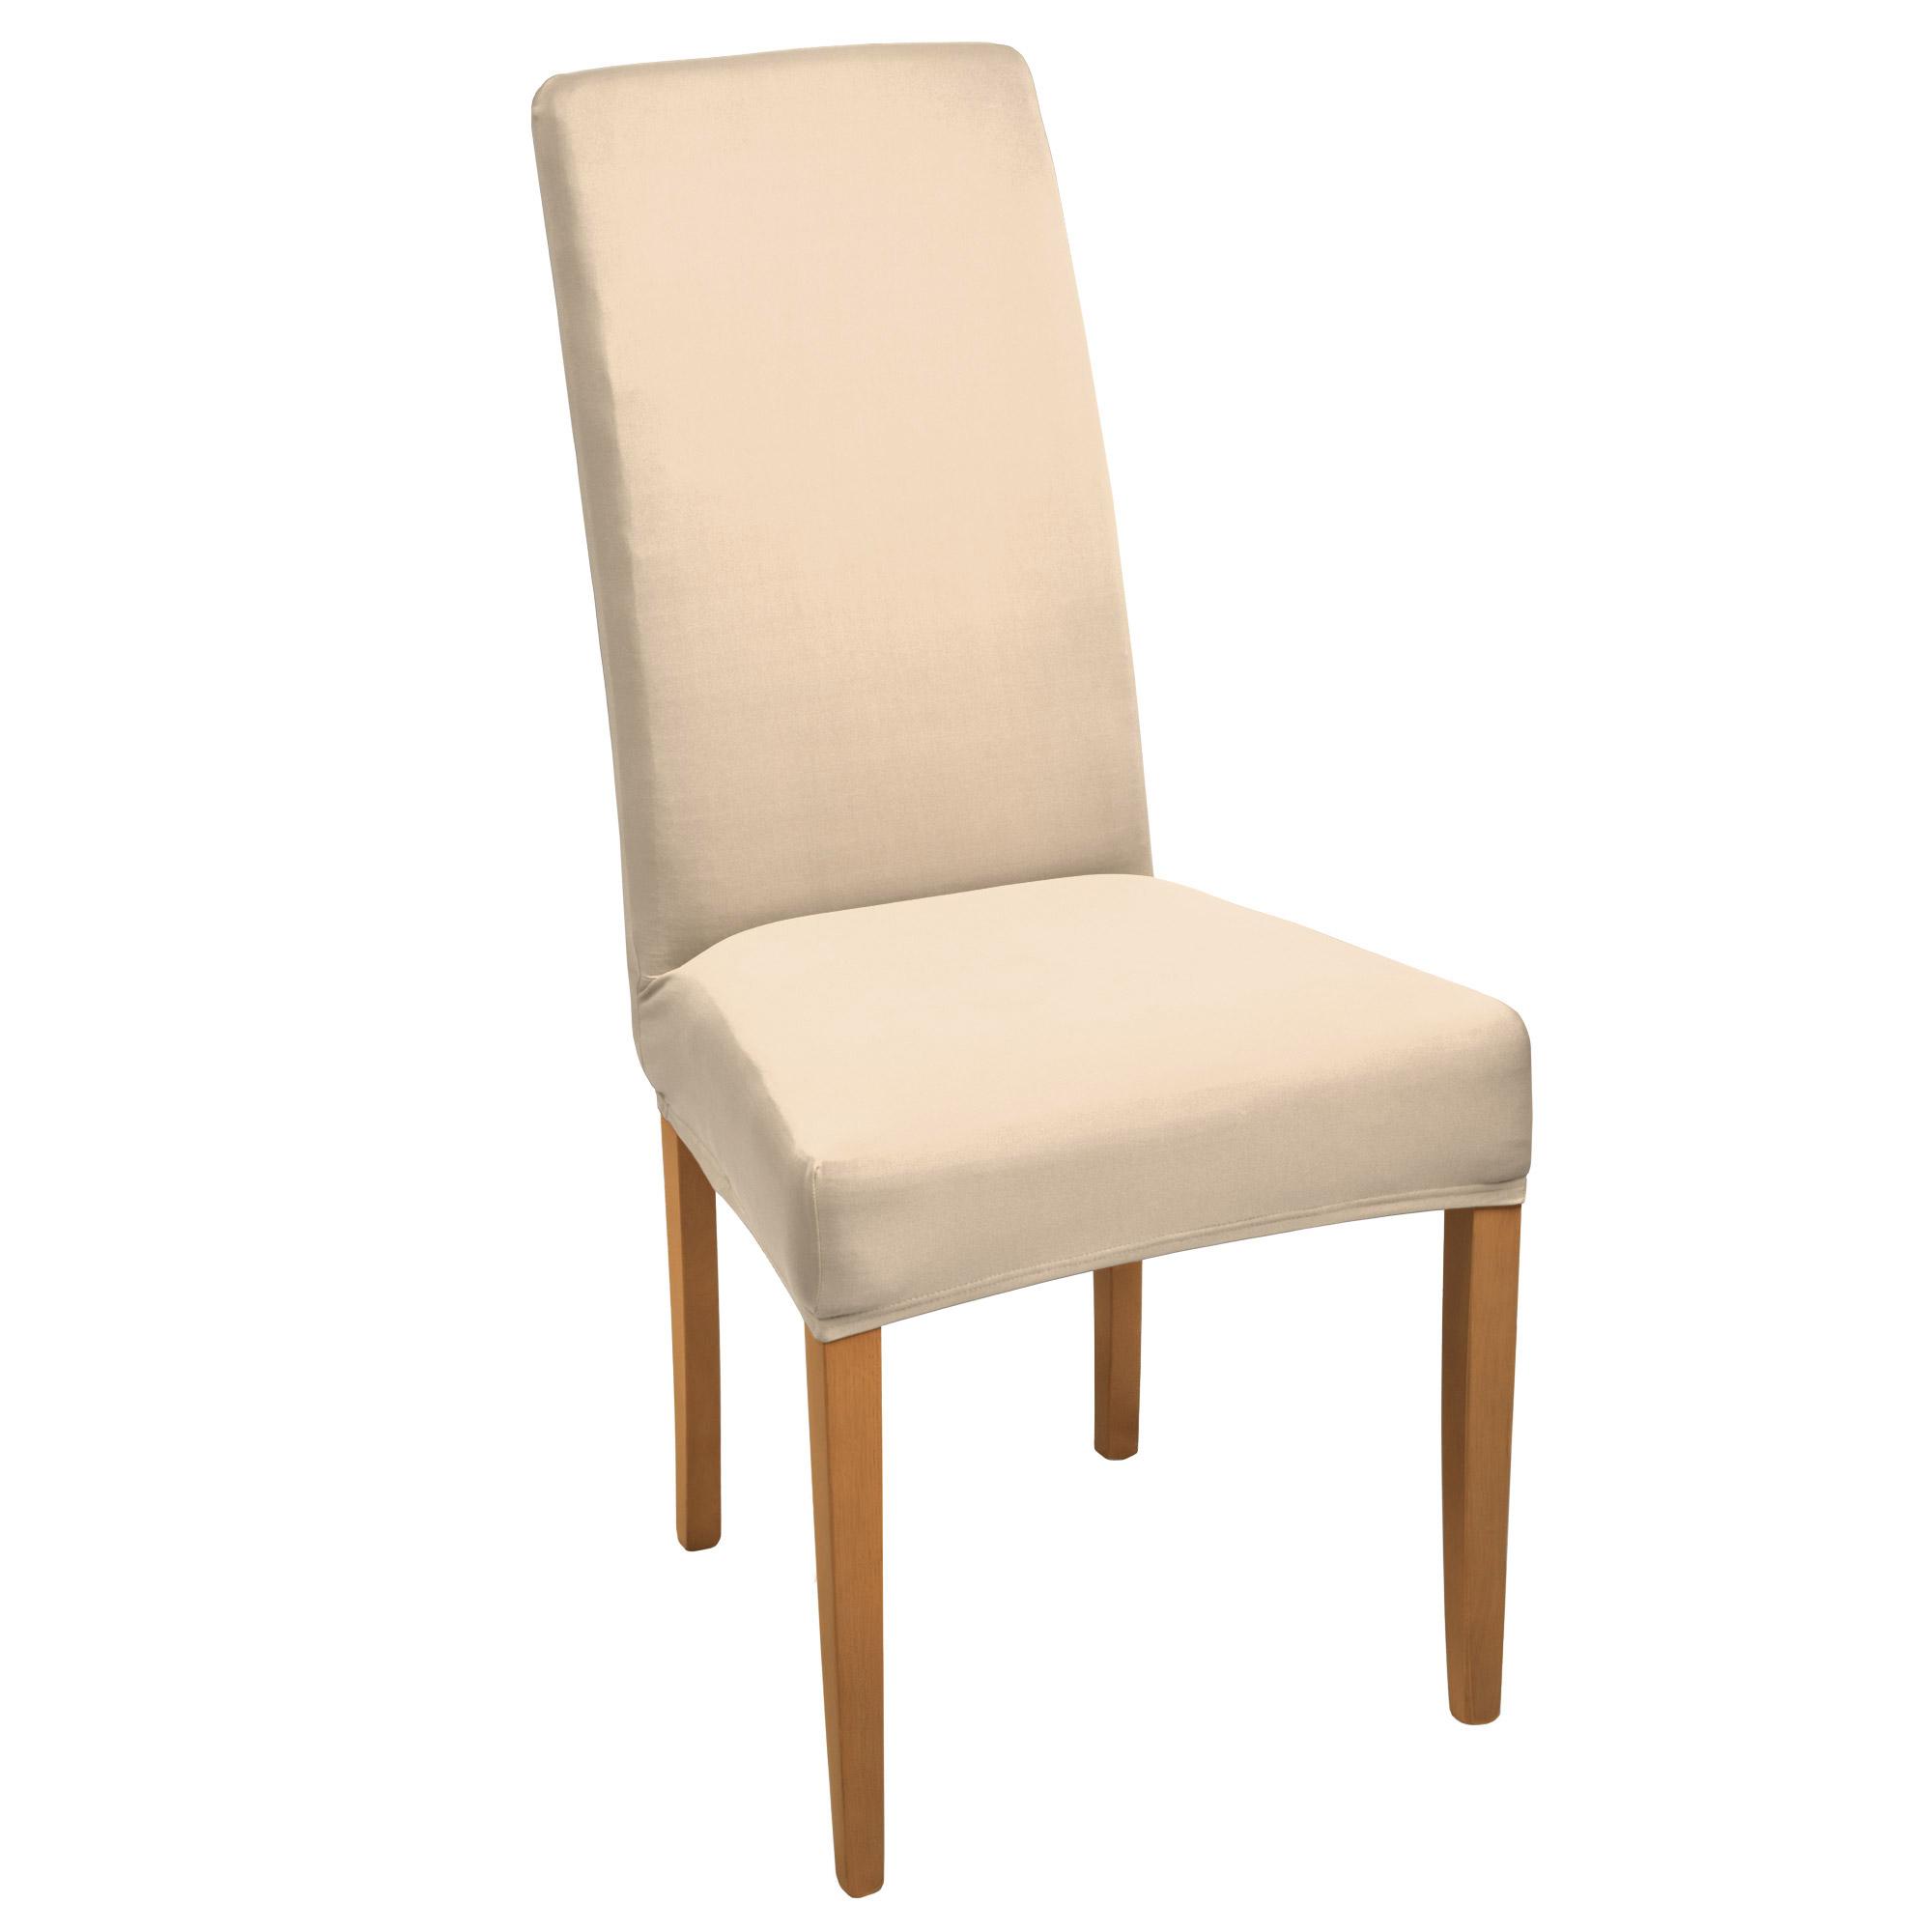 stuhlhusse stretch mia kurz ecru online kaufen. Black Bedroom Furniture Sets. Home Design Ideas